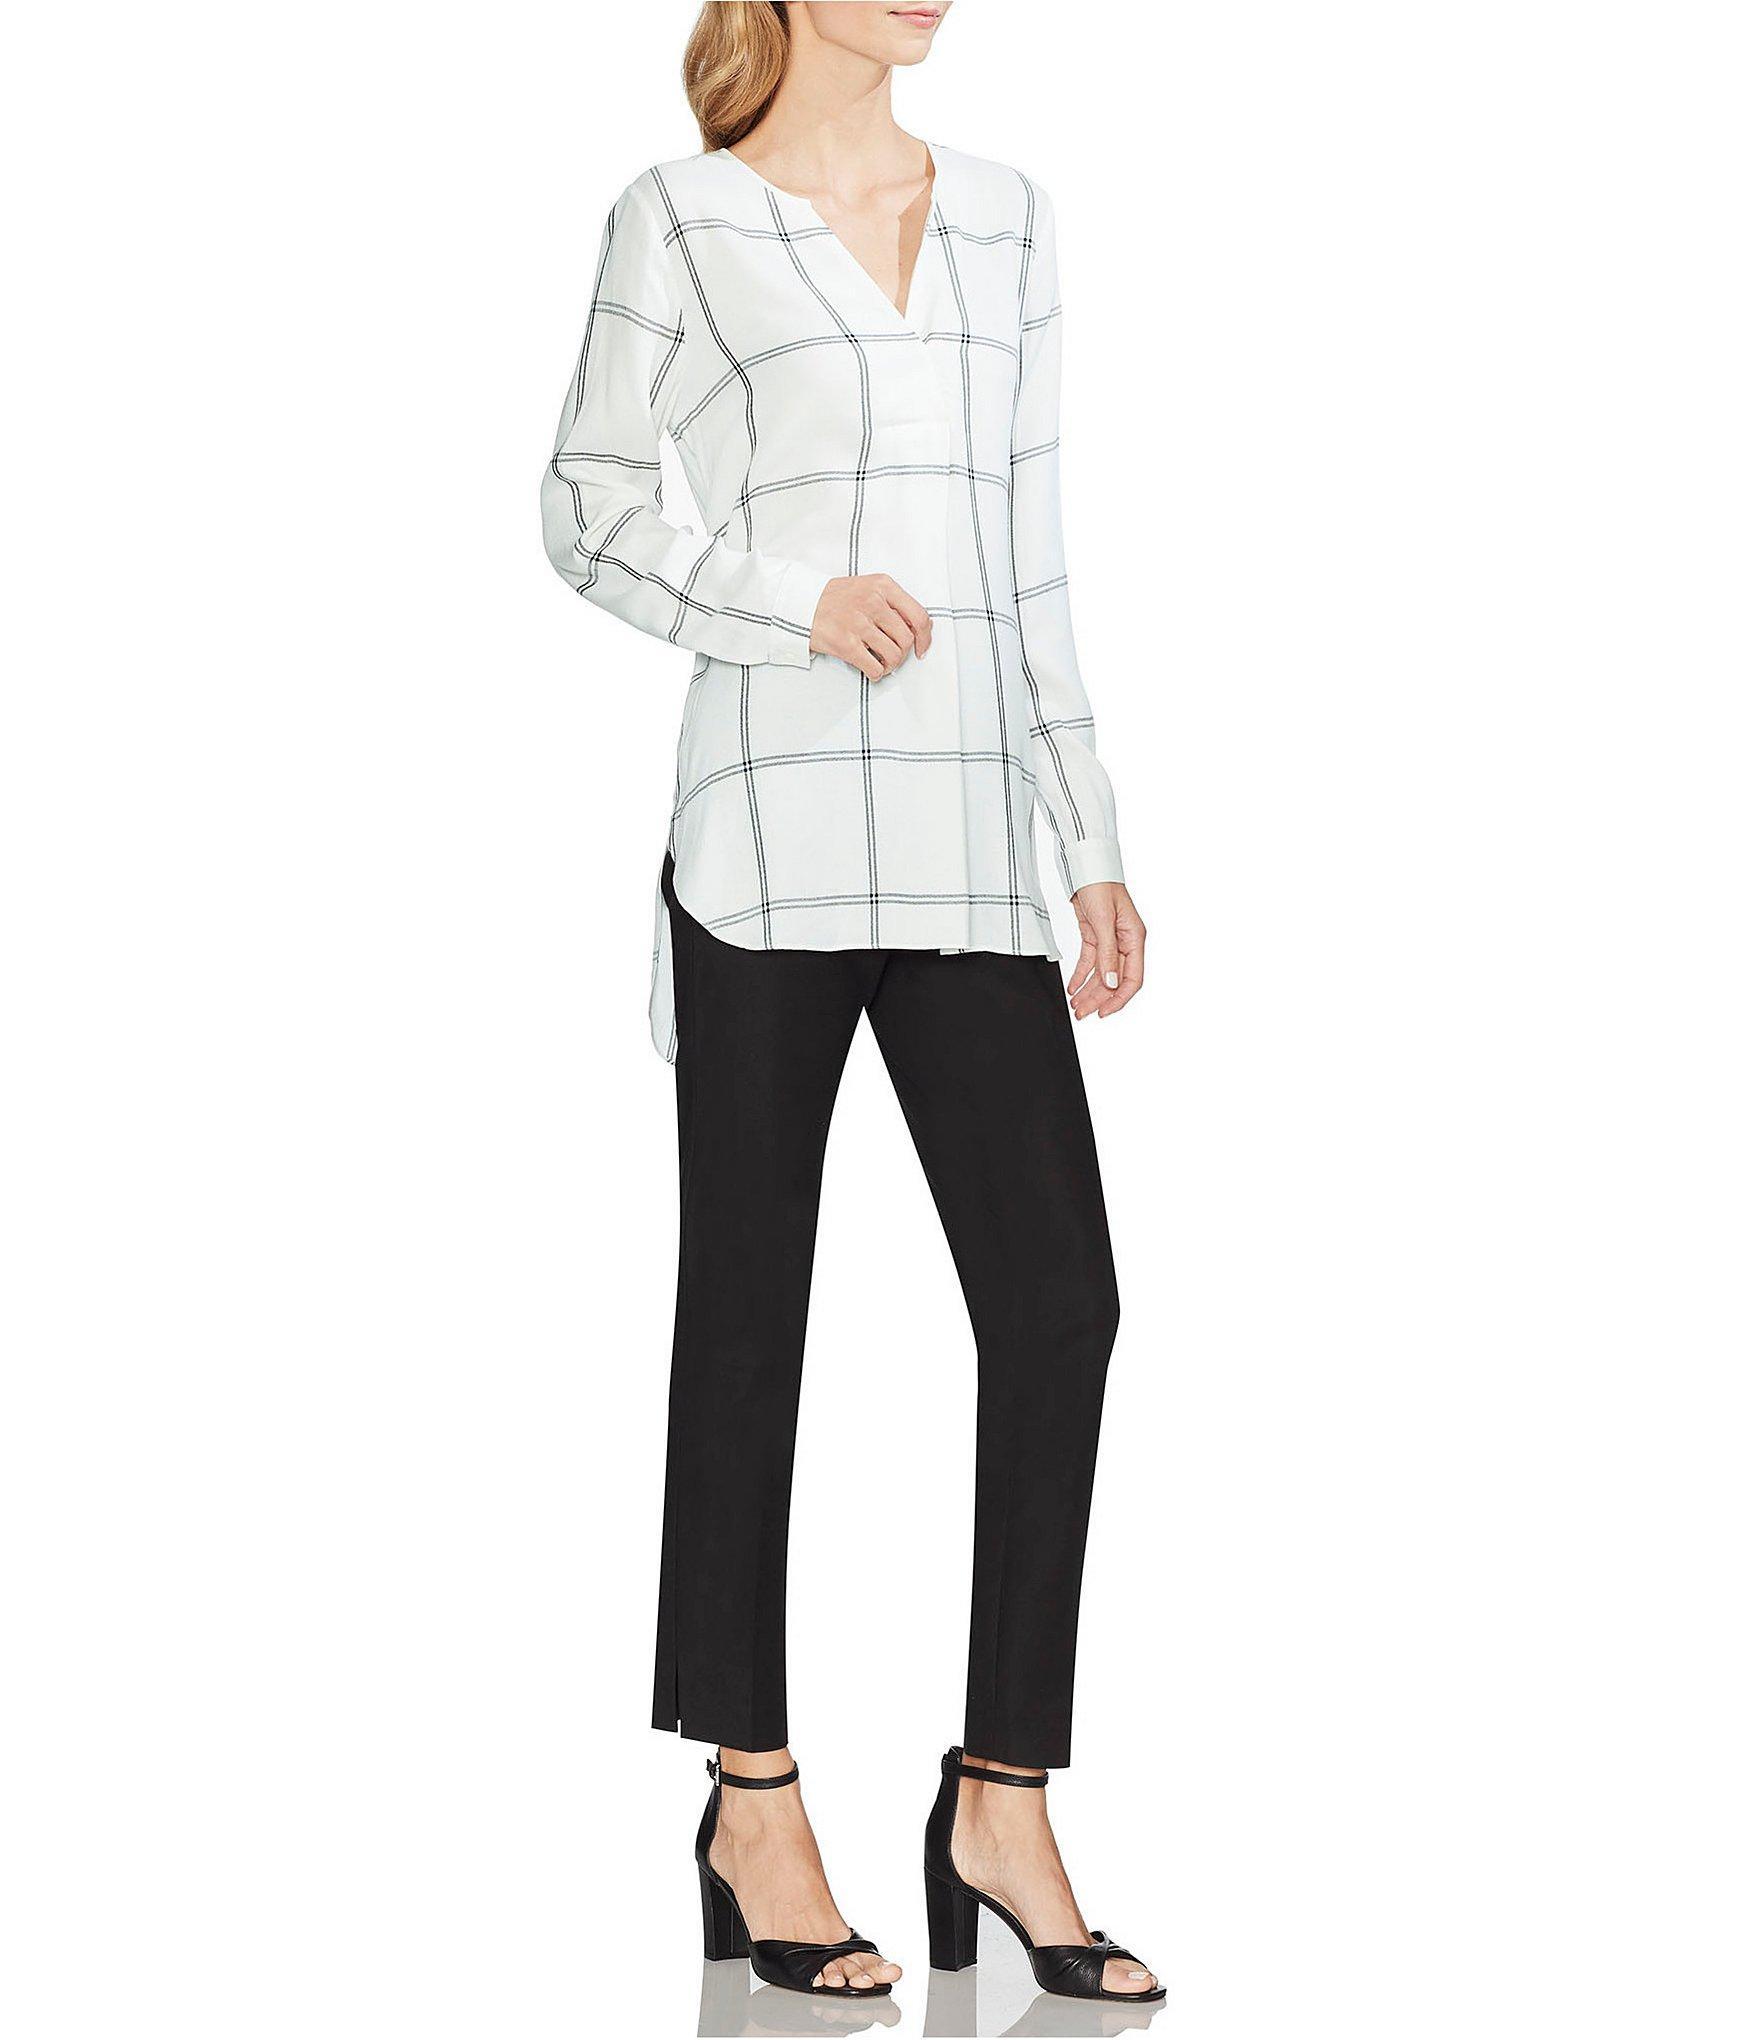 6d388fdb3fc86 Vince Camuto - White Long Sleeve Windowpane Striped Split Neck Tunic Blouse  - Lyst. View fullscreen